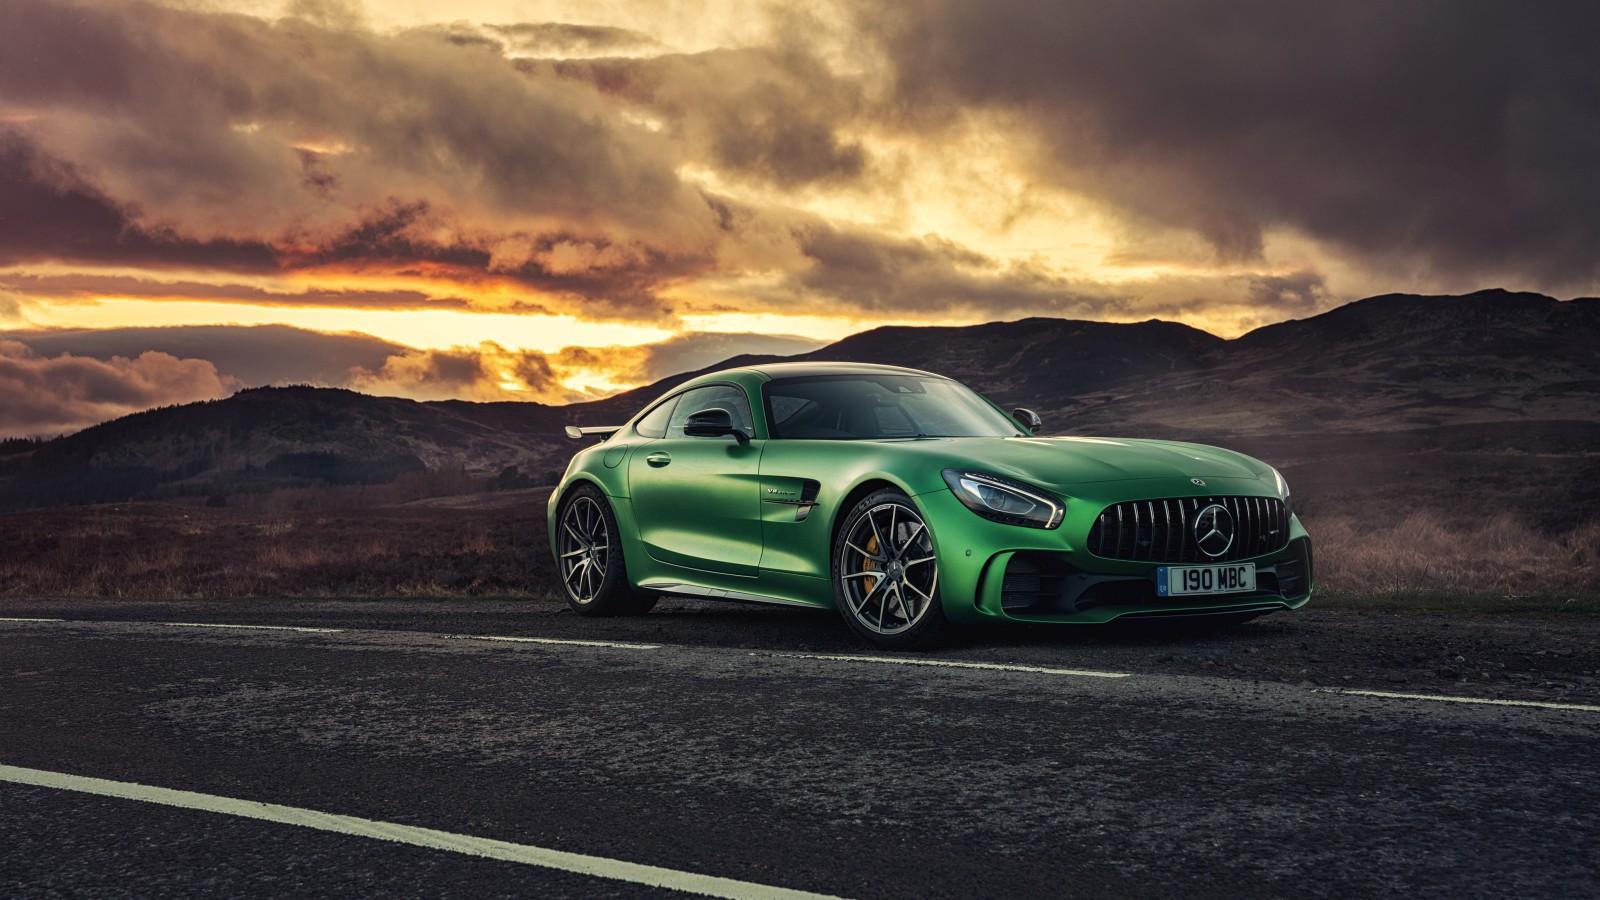 Mercedes Amg Gt R 2017 4k Wallpaper Hd Car Wallpapers